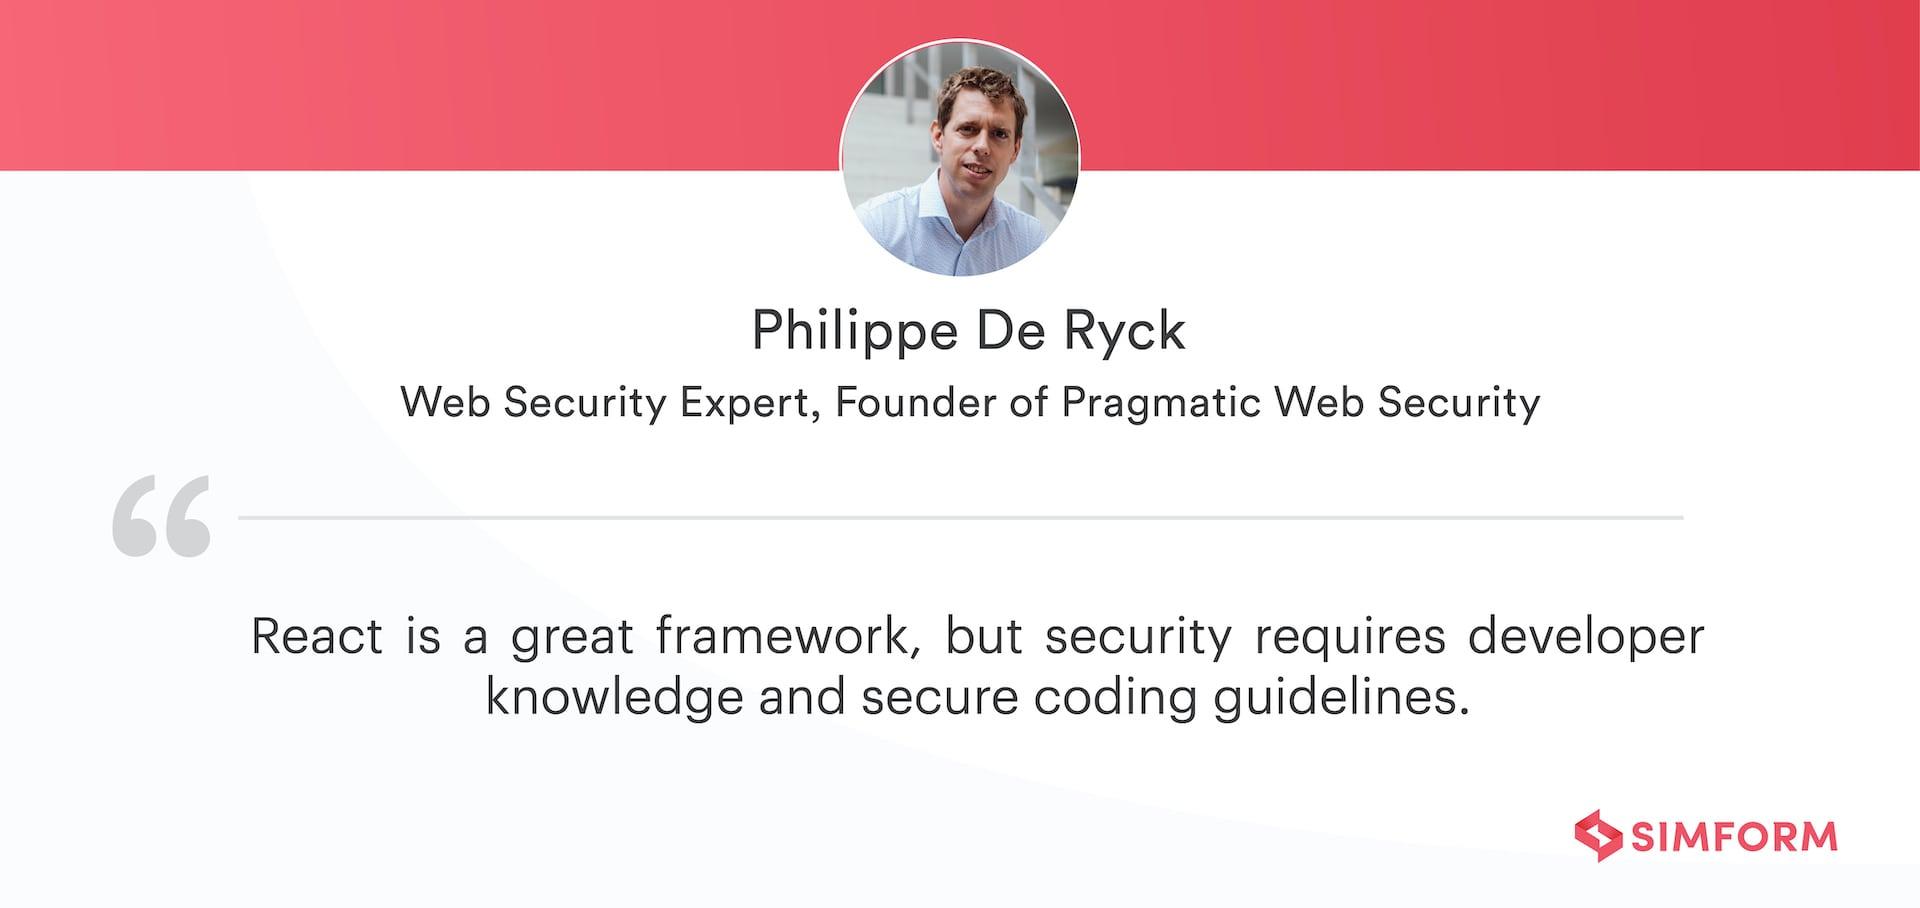 Philippe De Ryck Quote